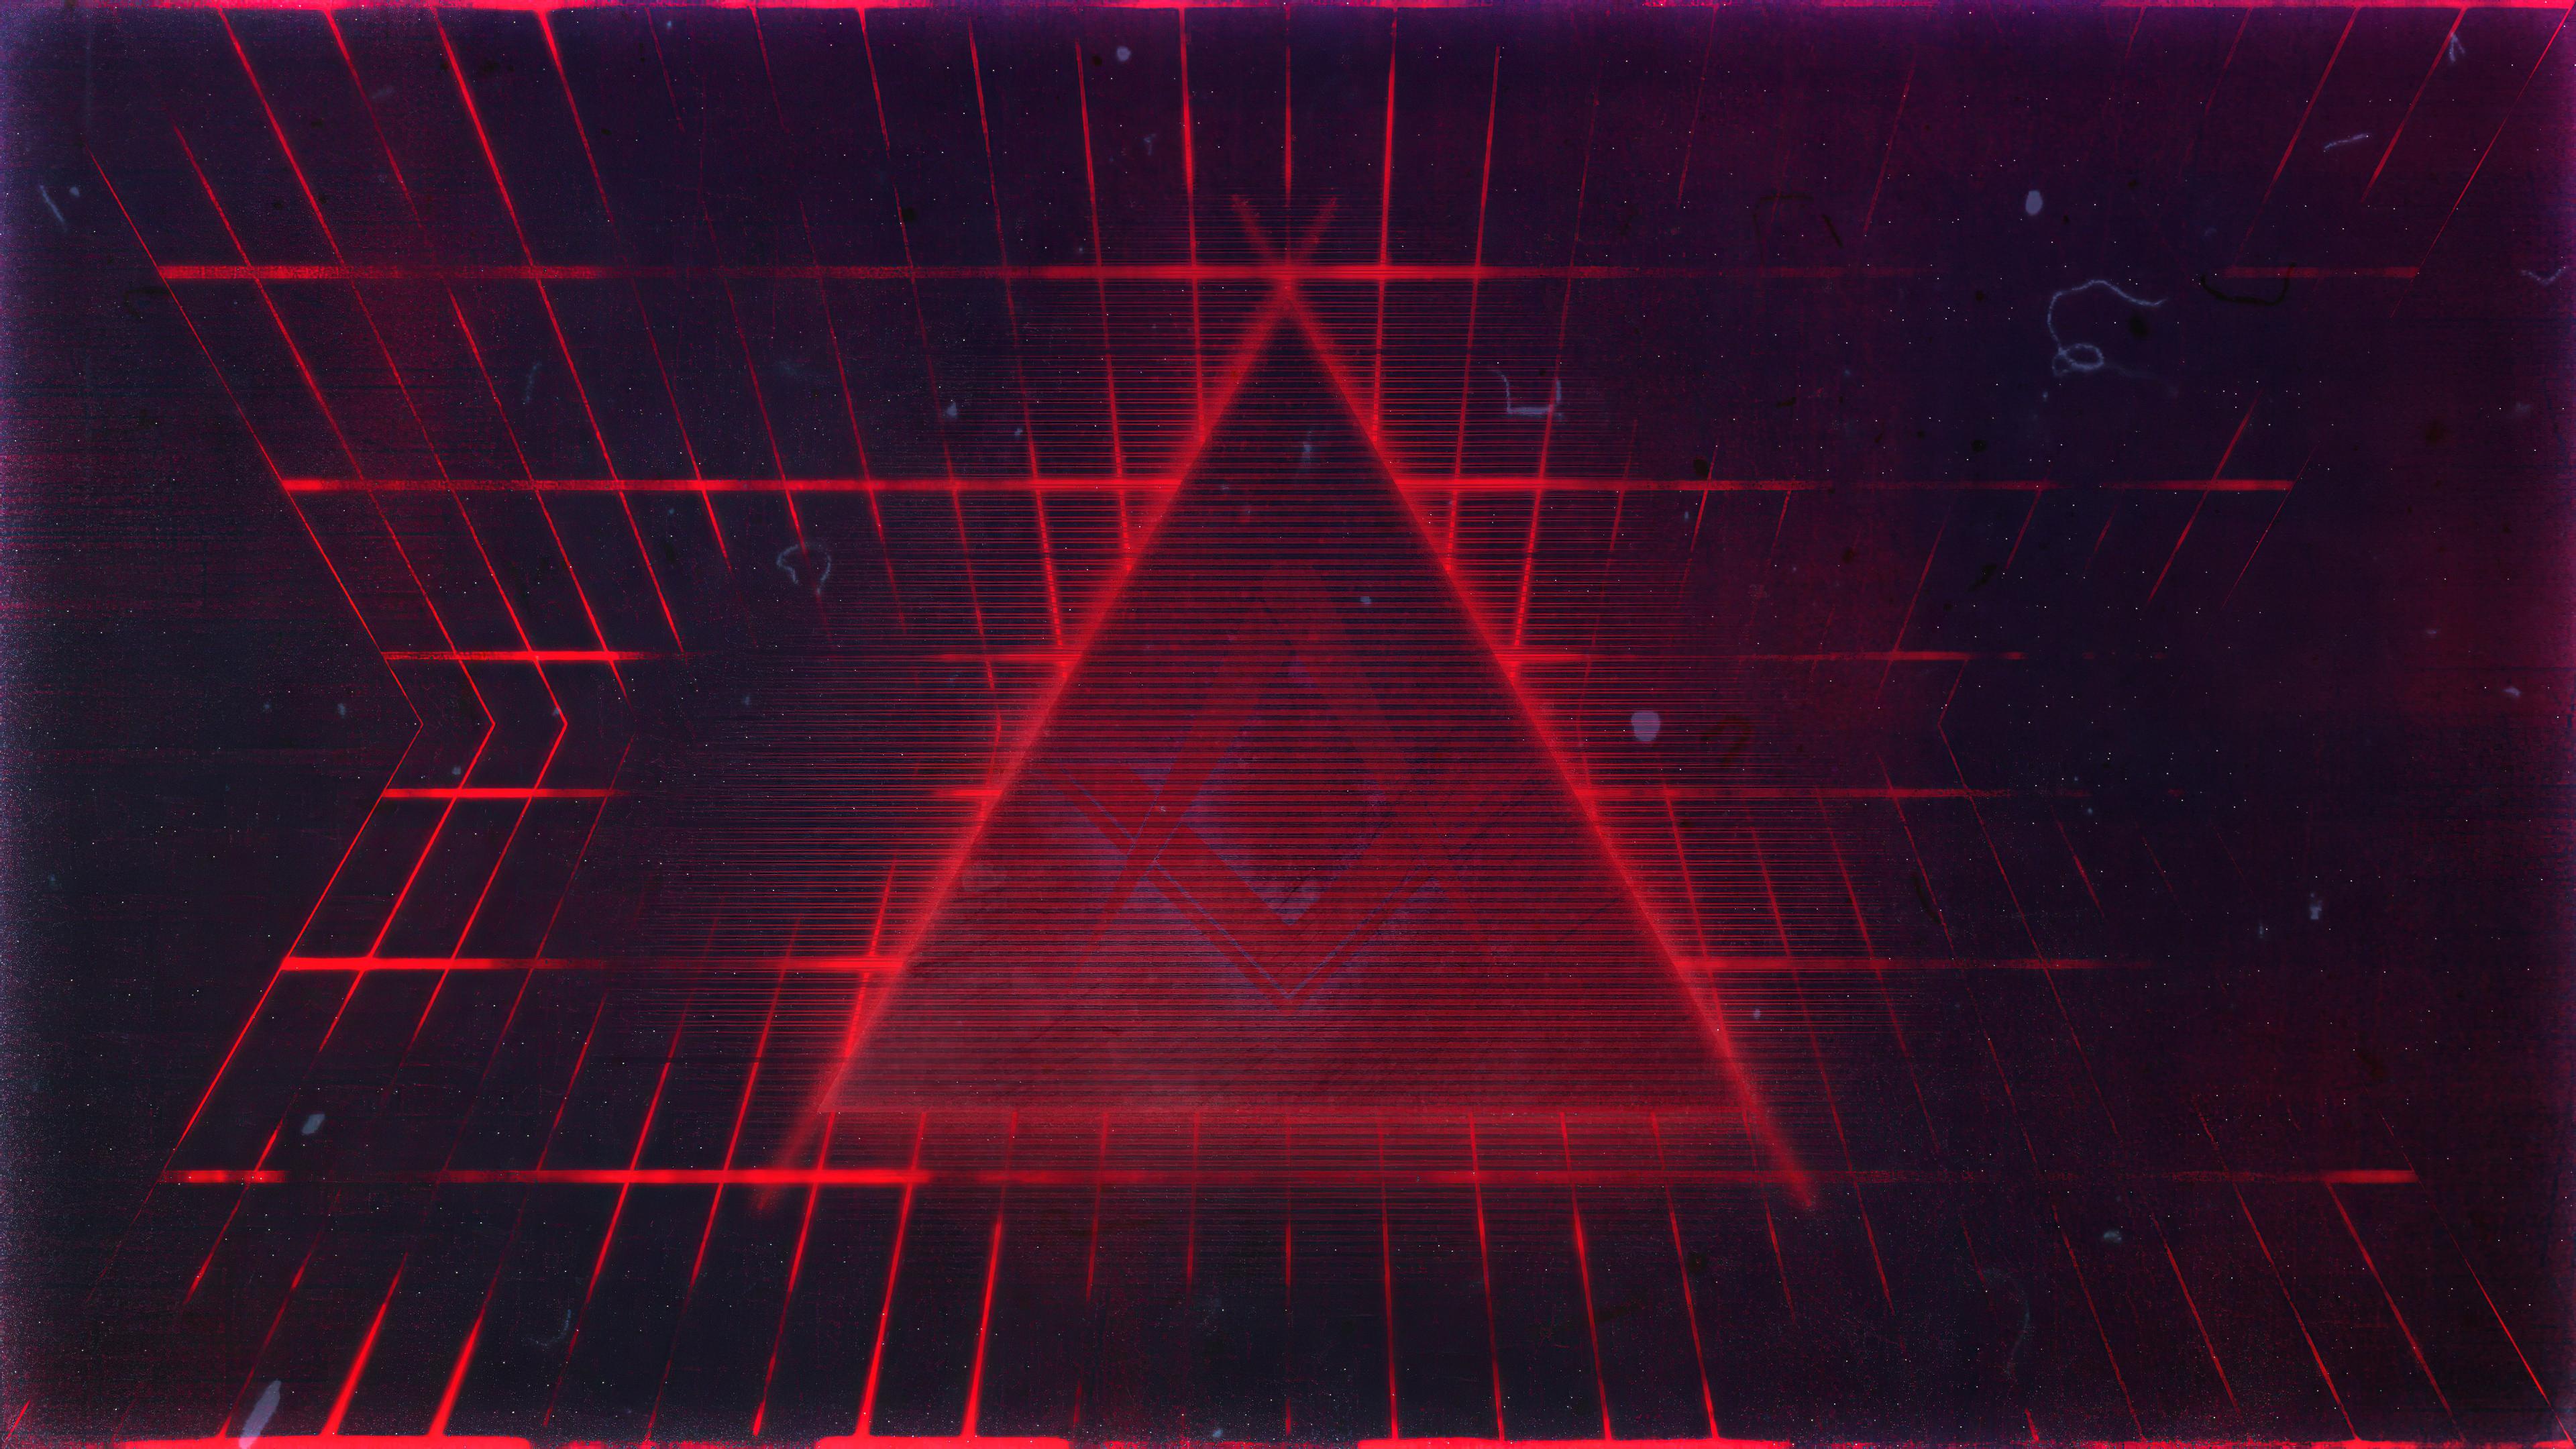 geometry red triangle 1575661456 - Geometry Red Triangle -